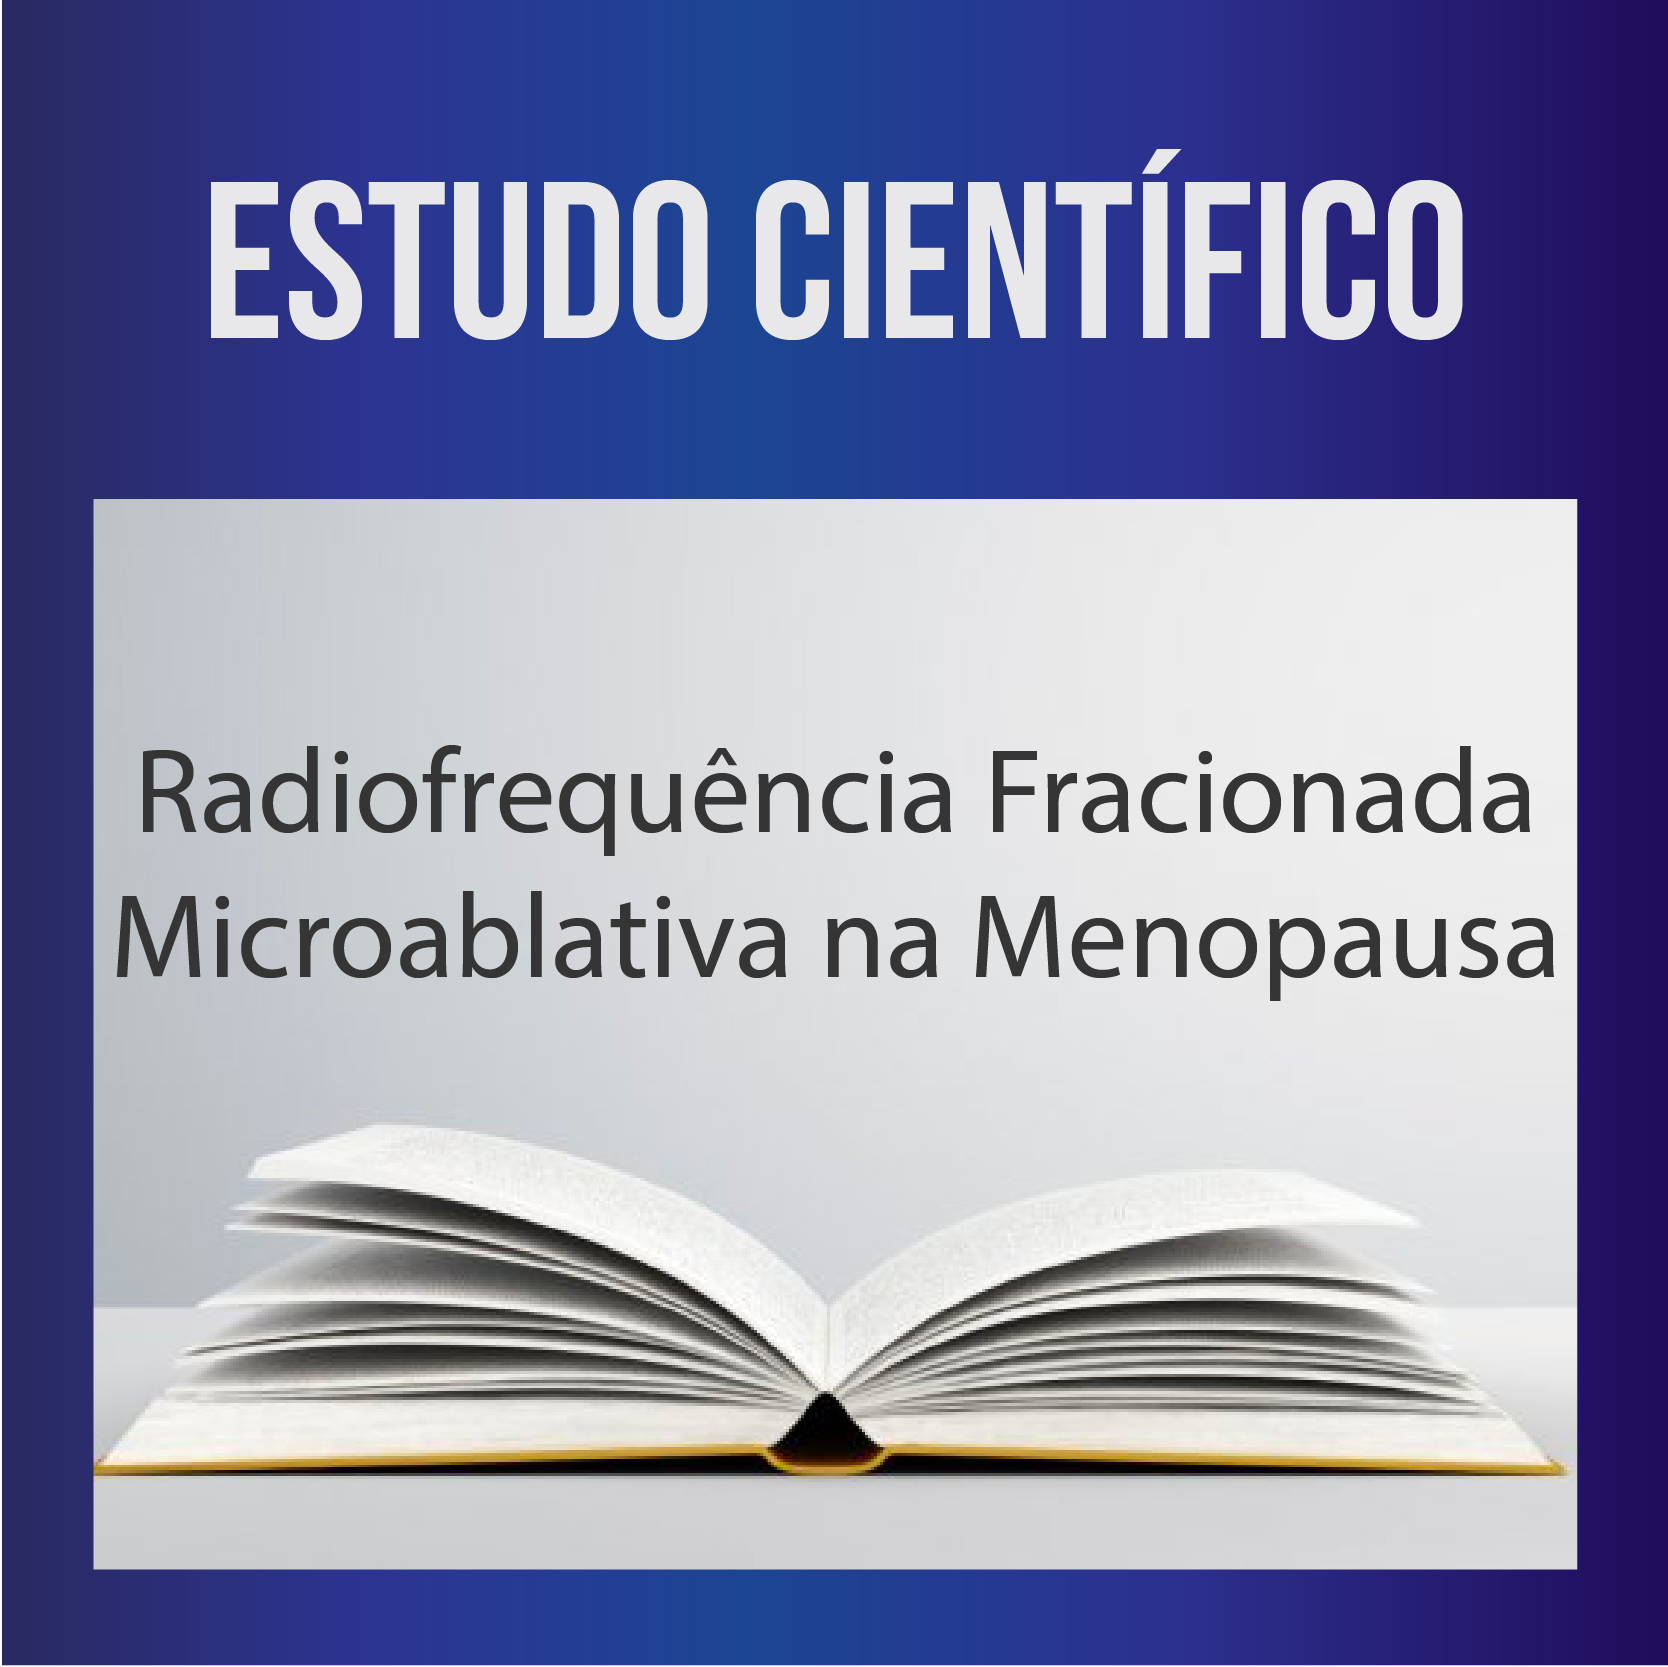 Radiofrequência Fracionada Microablativa na Menopausa